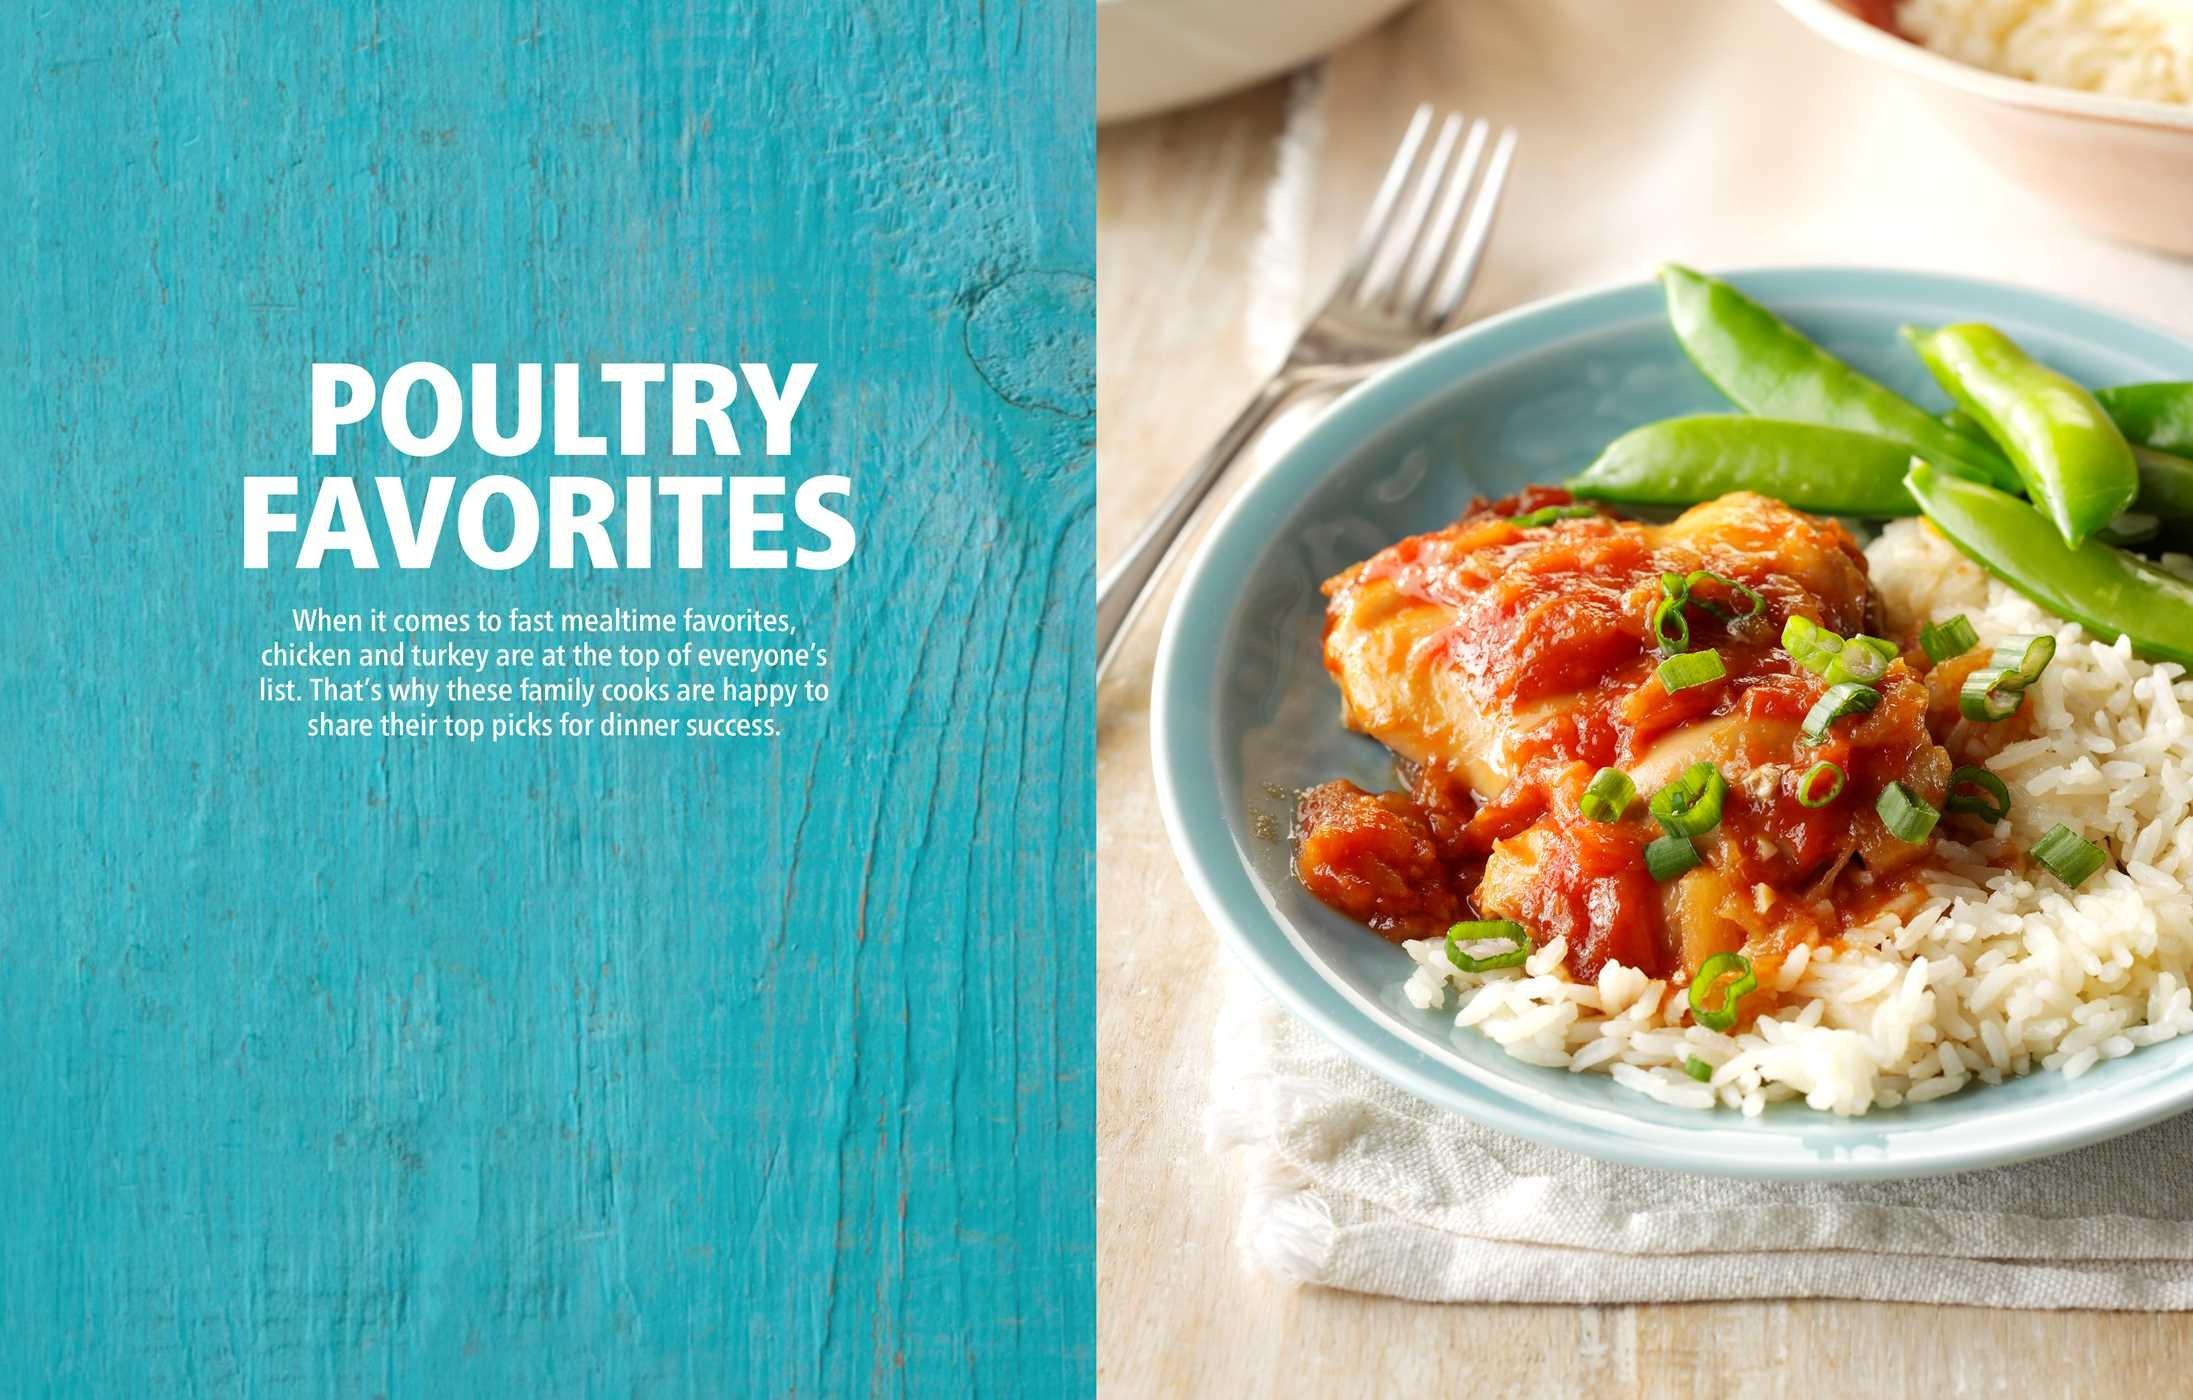 Taste of home instant pot cookbook 9781617657665.in06